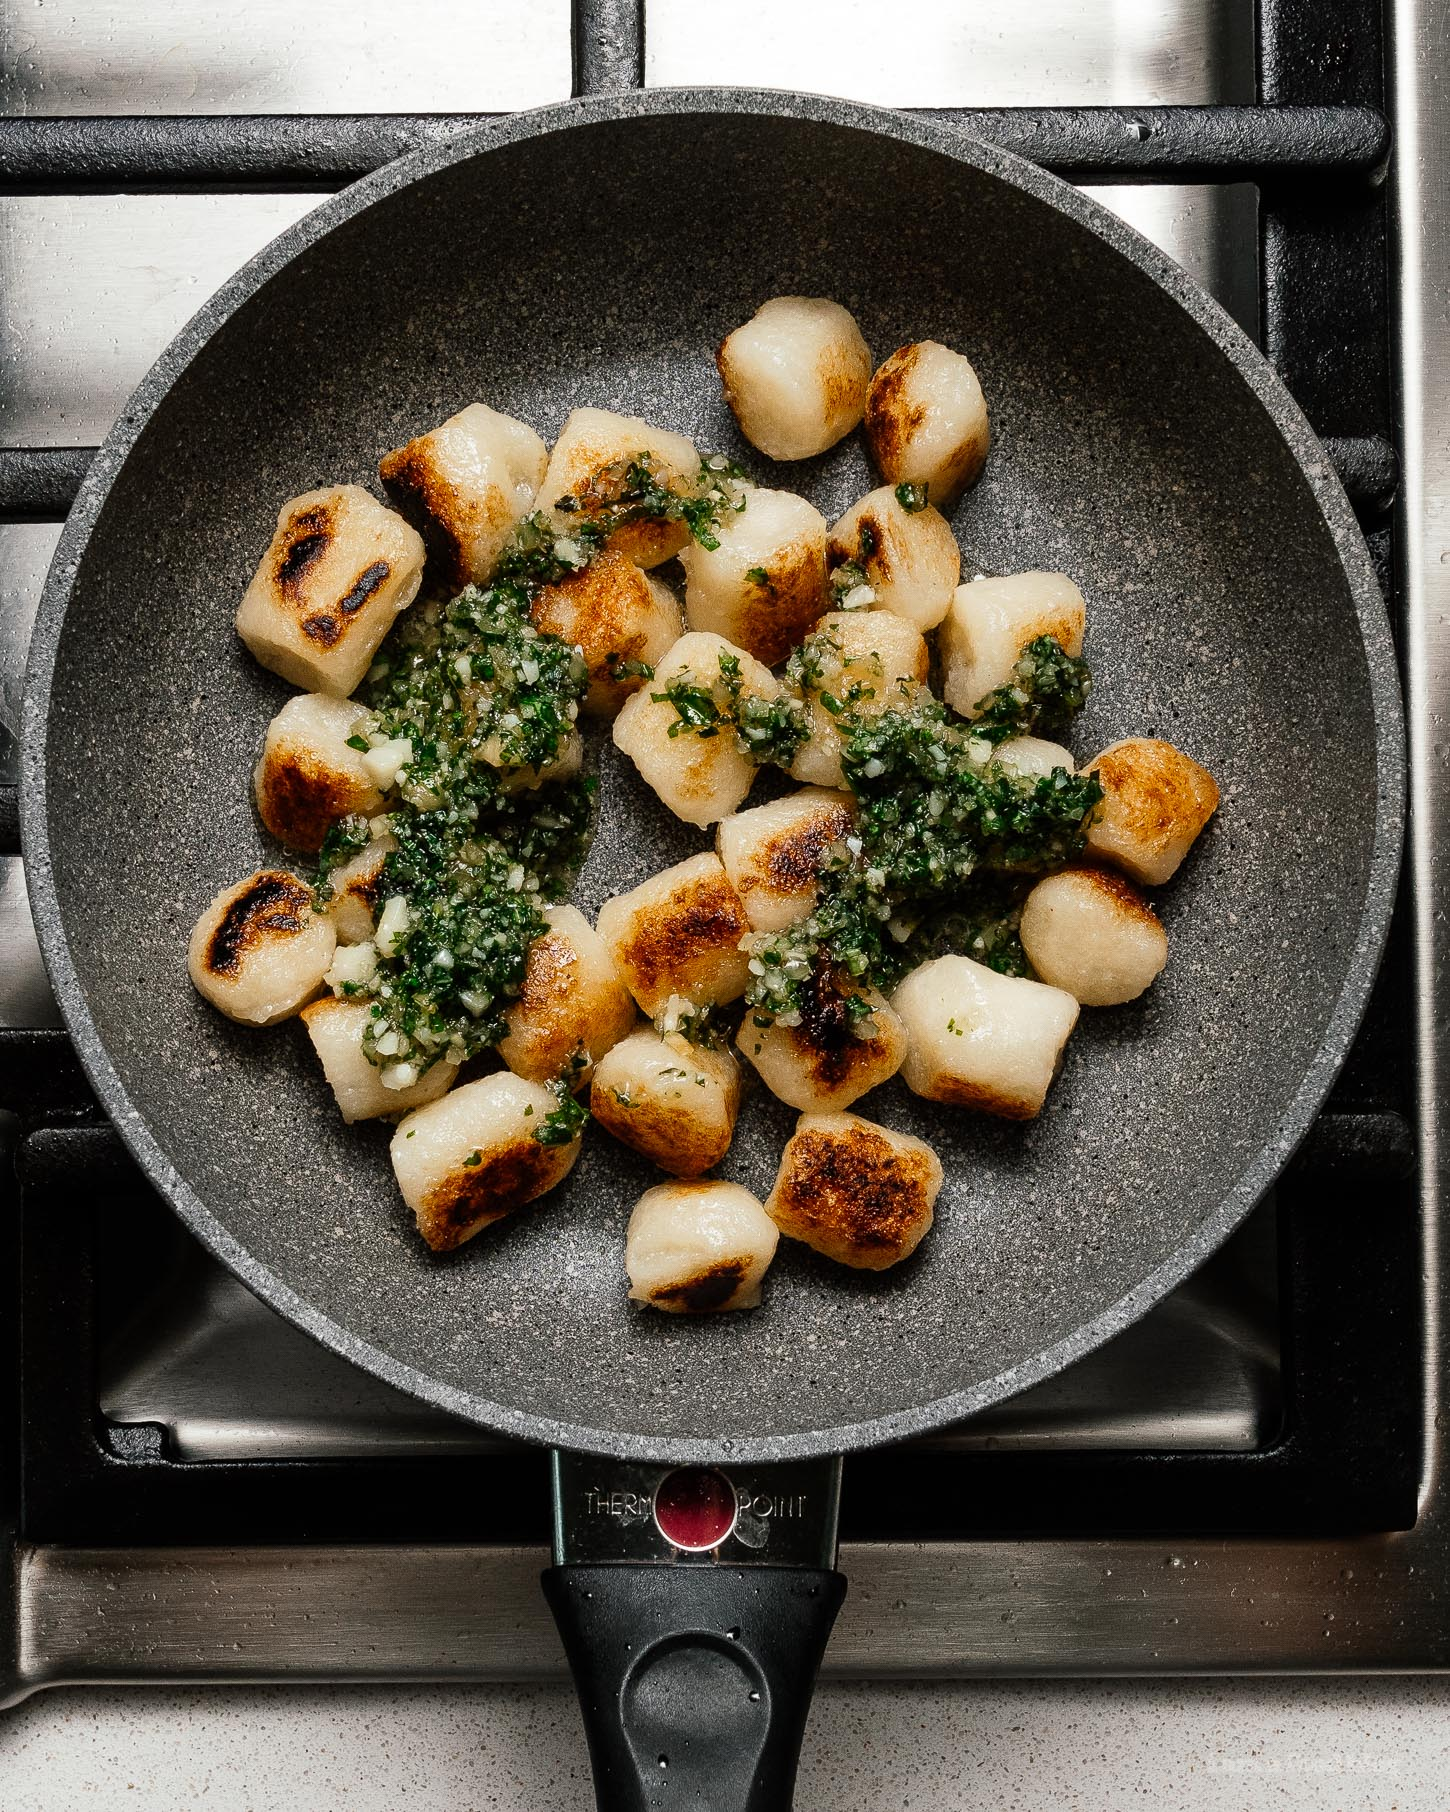 Pesto cauliflower gnocchi: low carb, healthy, and so so delicious #pesto #cauliflowergnocchi #traderjoesrecipes #recipes #tjs